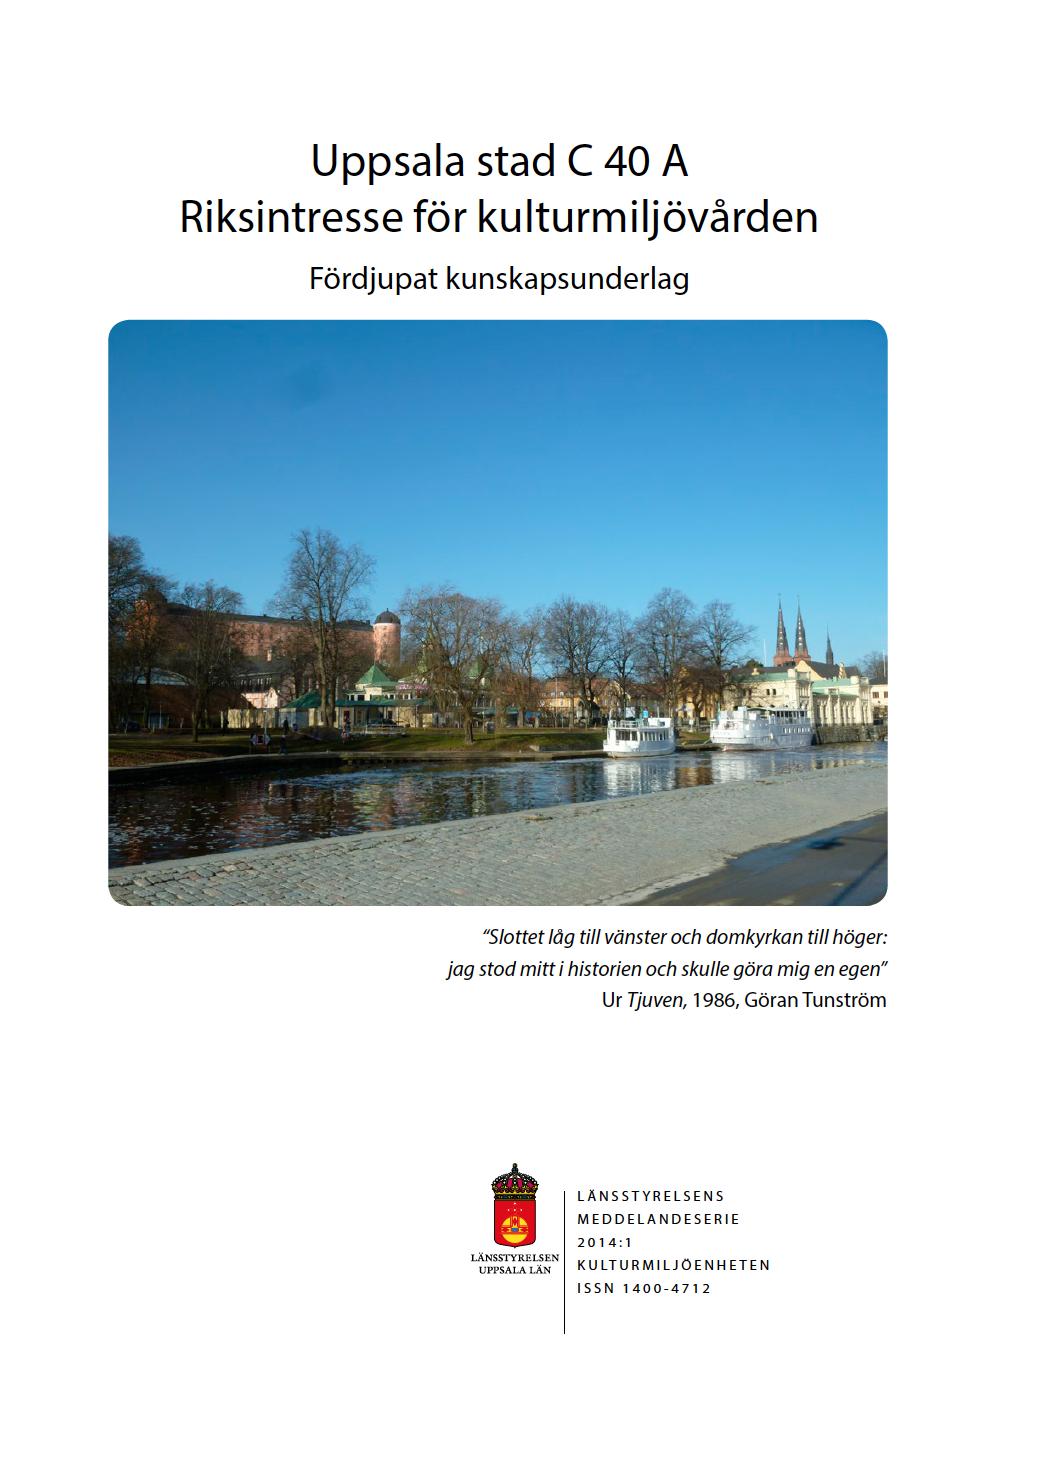 Uppsala stad A Riksintresse, omslag